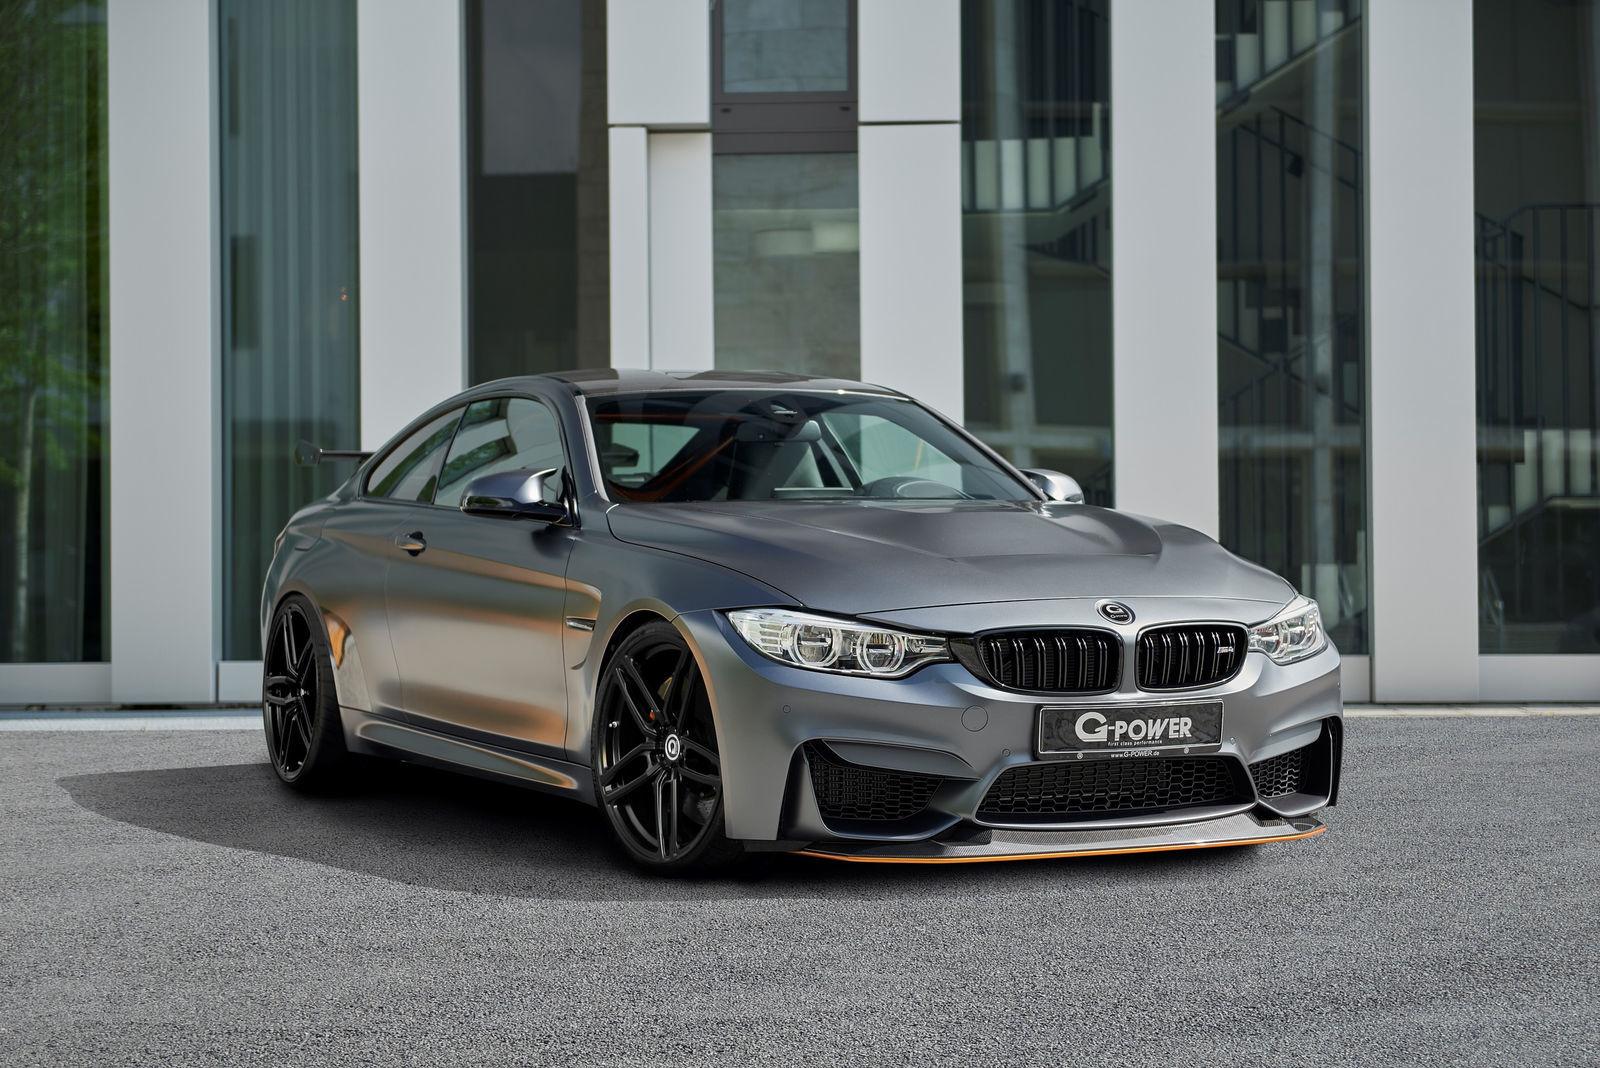 Foto de G-Power BMW M4 GTS (1/5)